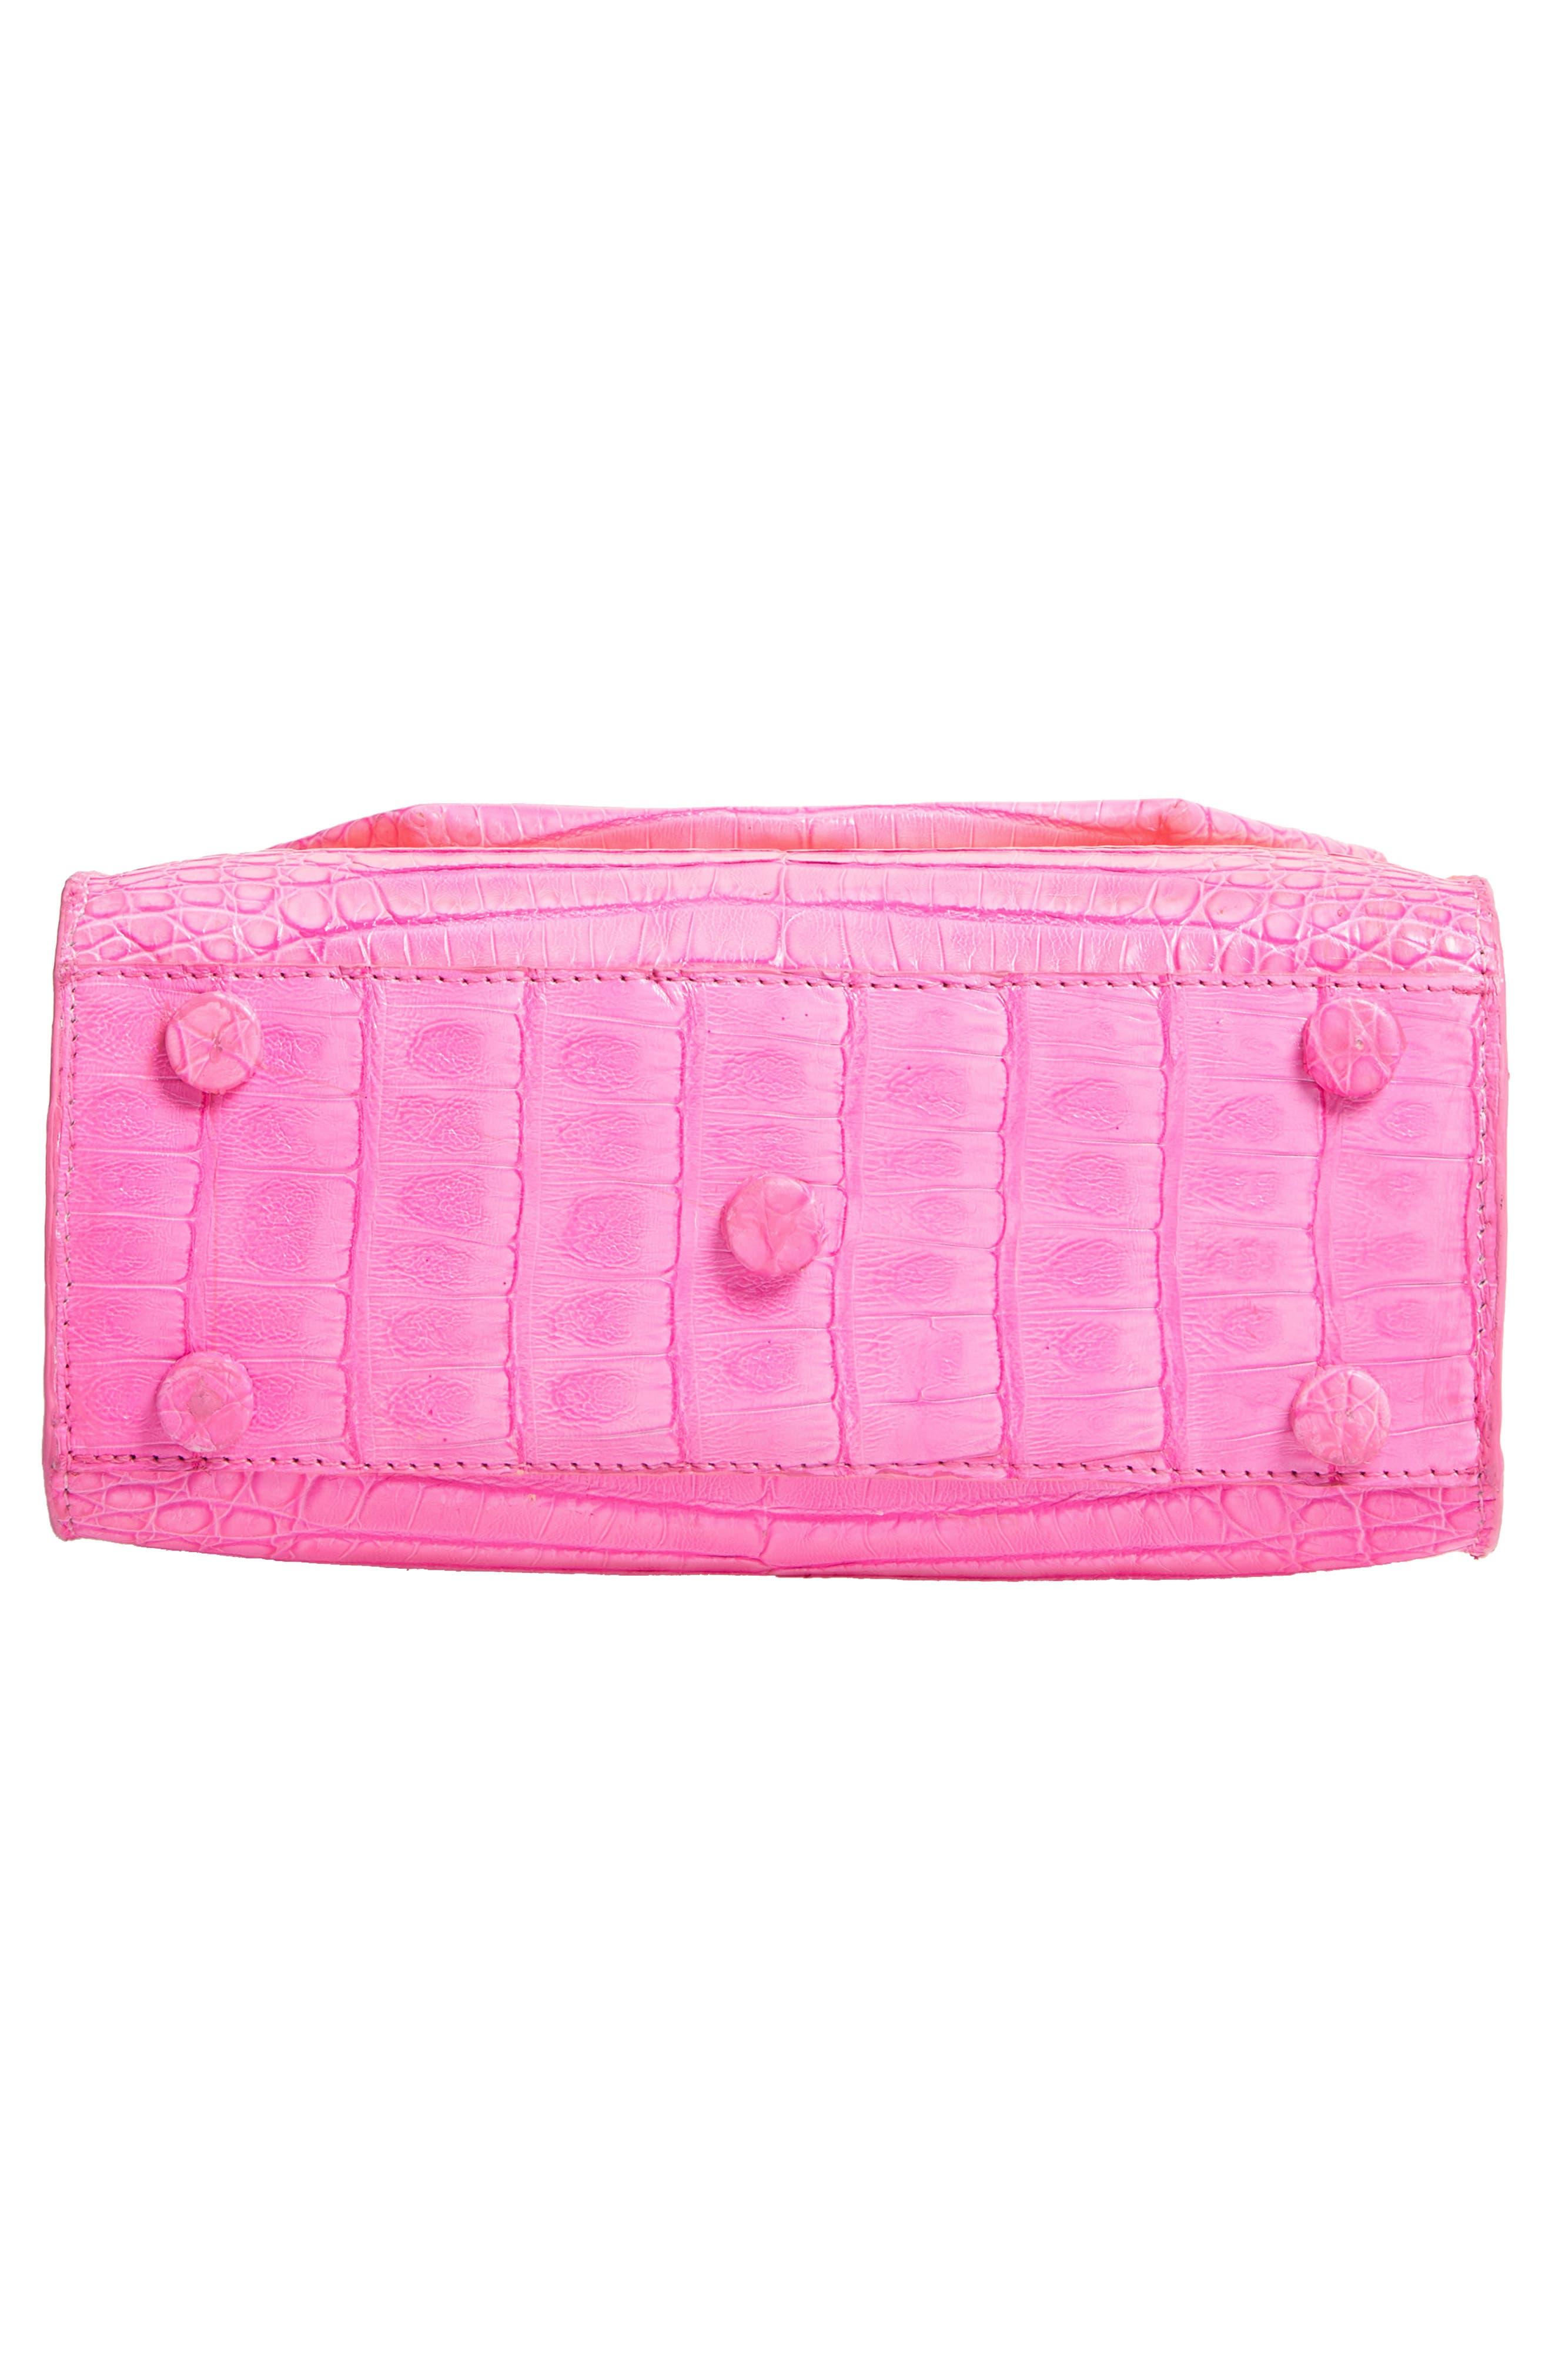 NANCY GONZALEZ, Mini Lily Genuine Crocodile Crossbody Bag, Alternate thumbnail 6, color, PINK DEGRADE